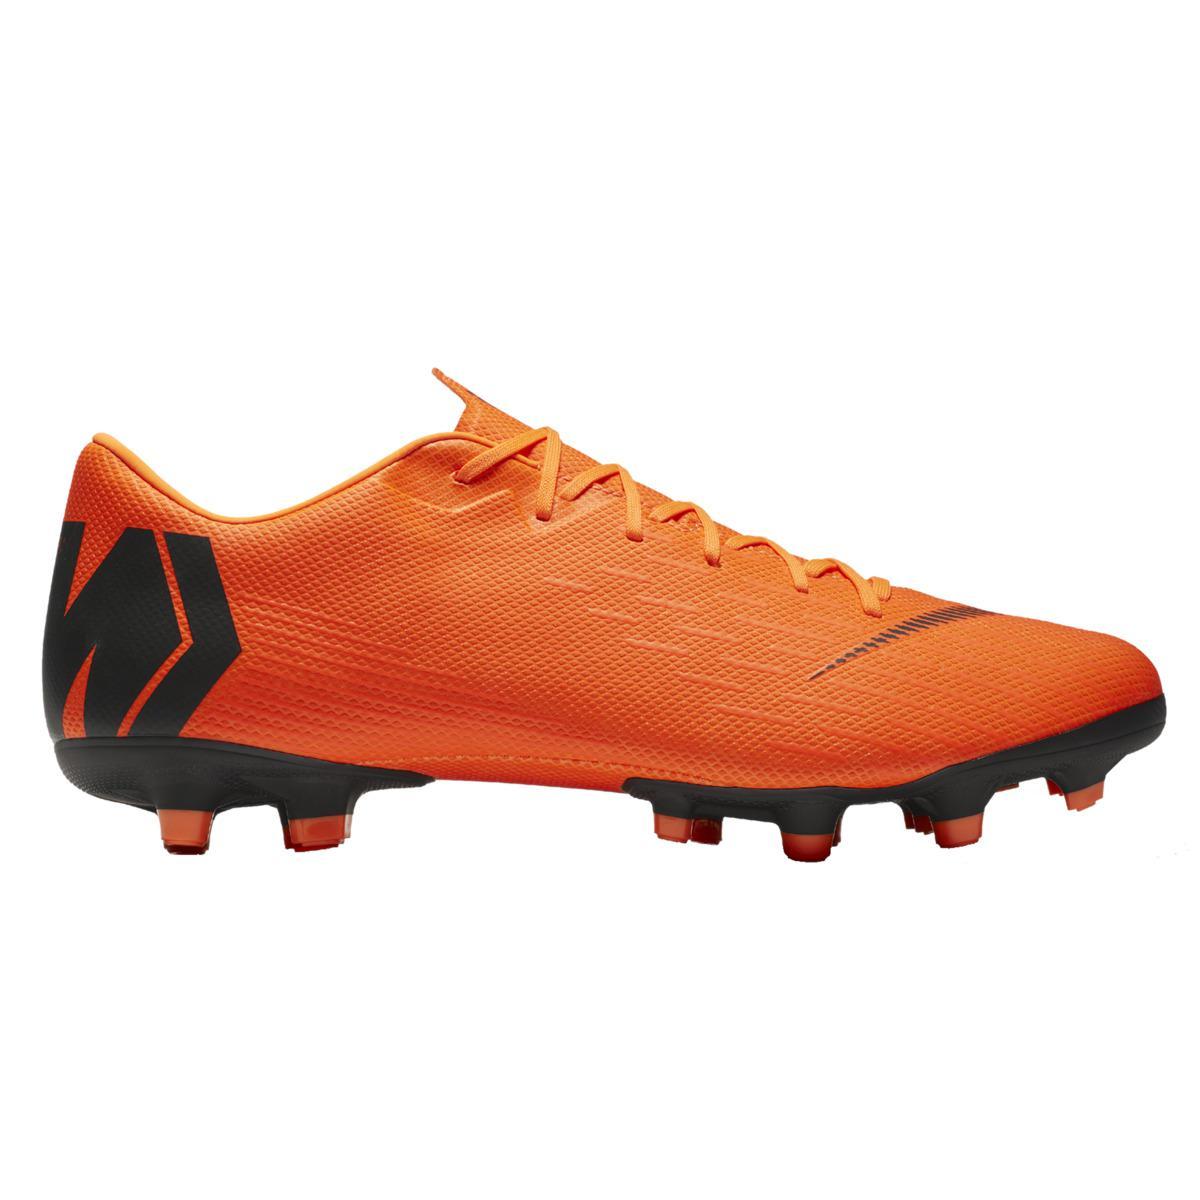 c96b613f1 Nike Mercurial Vapor Xii Academy Mg Football Boots in Orange for Men ...